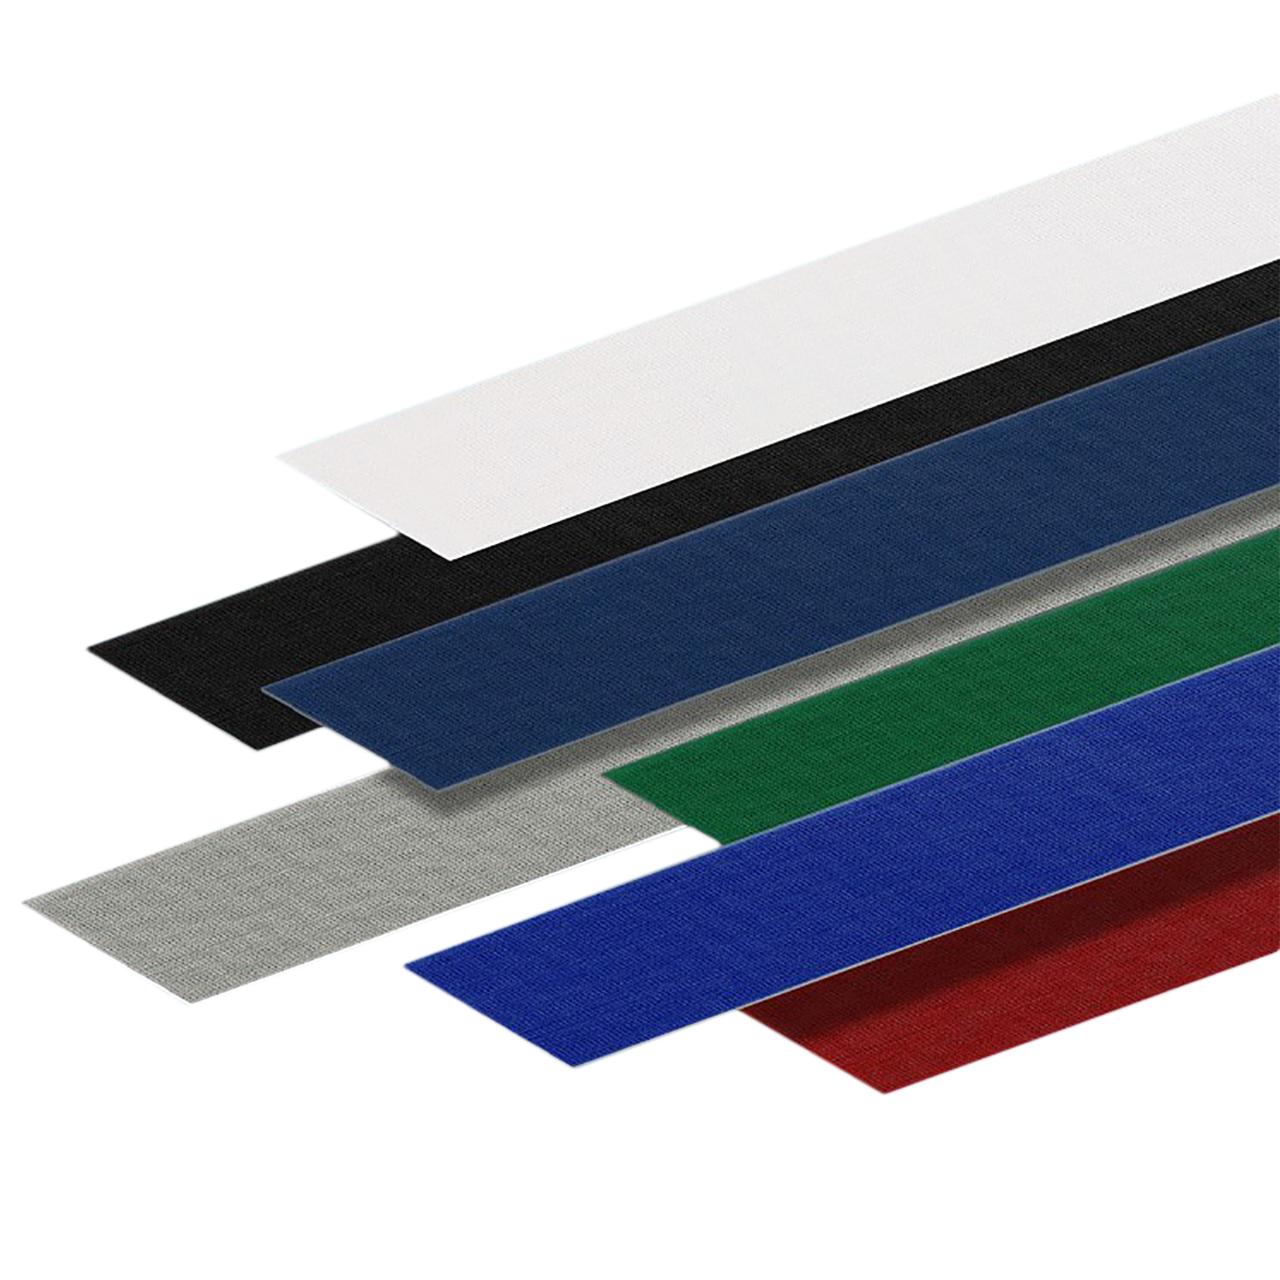 Planax Cobi Strips